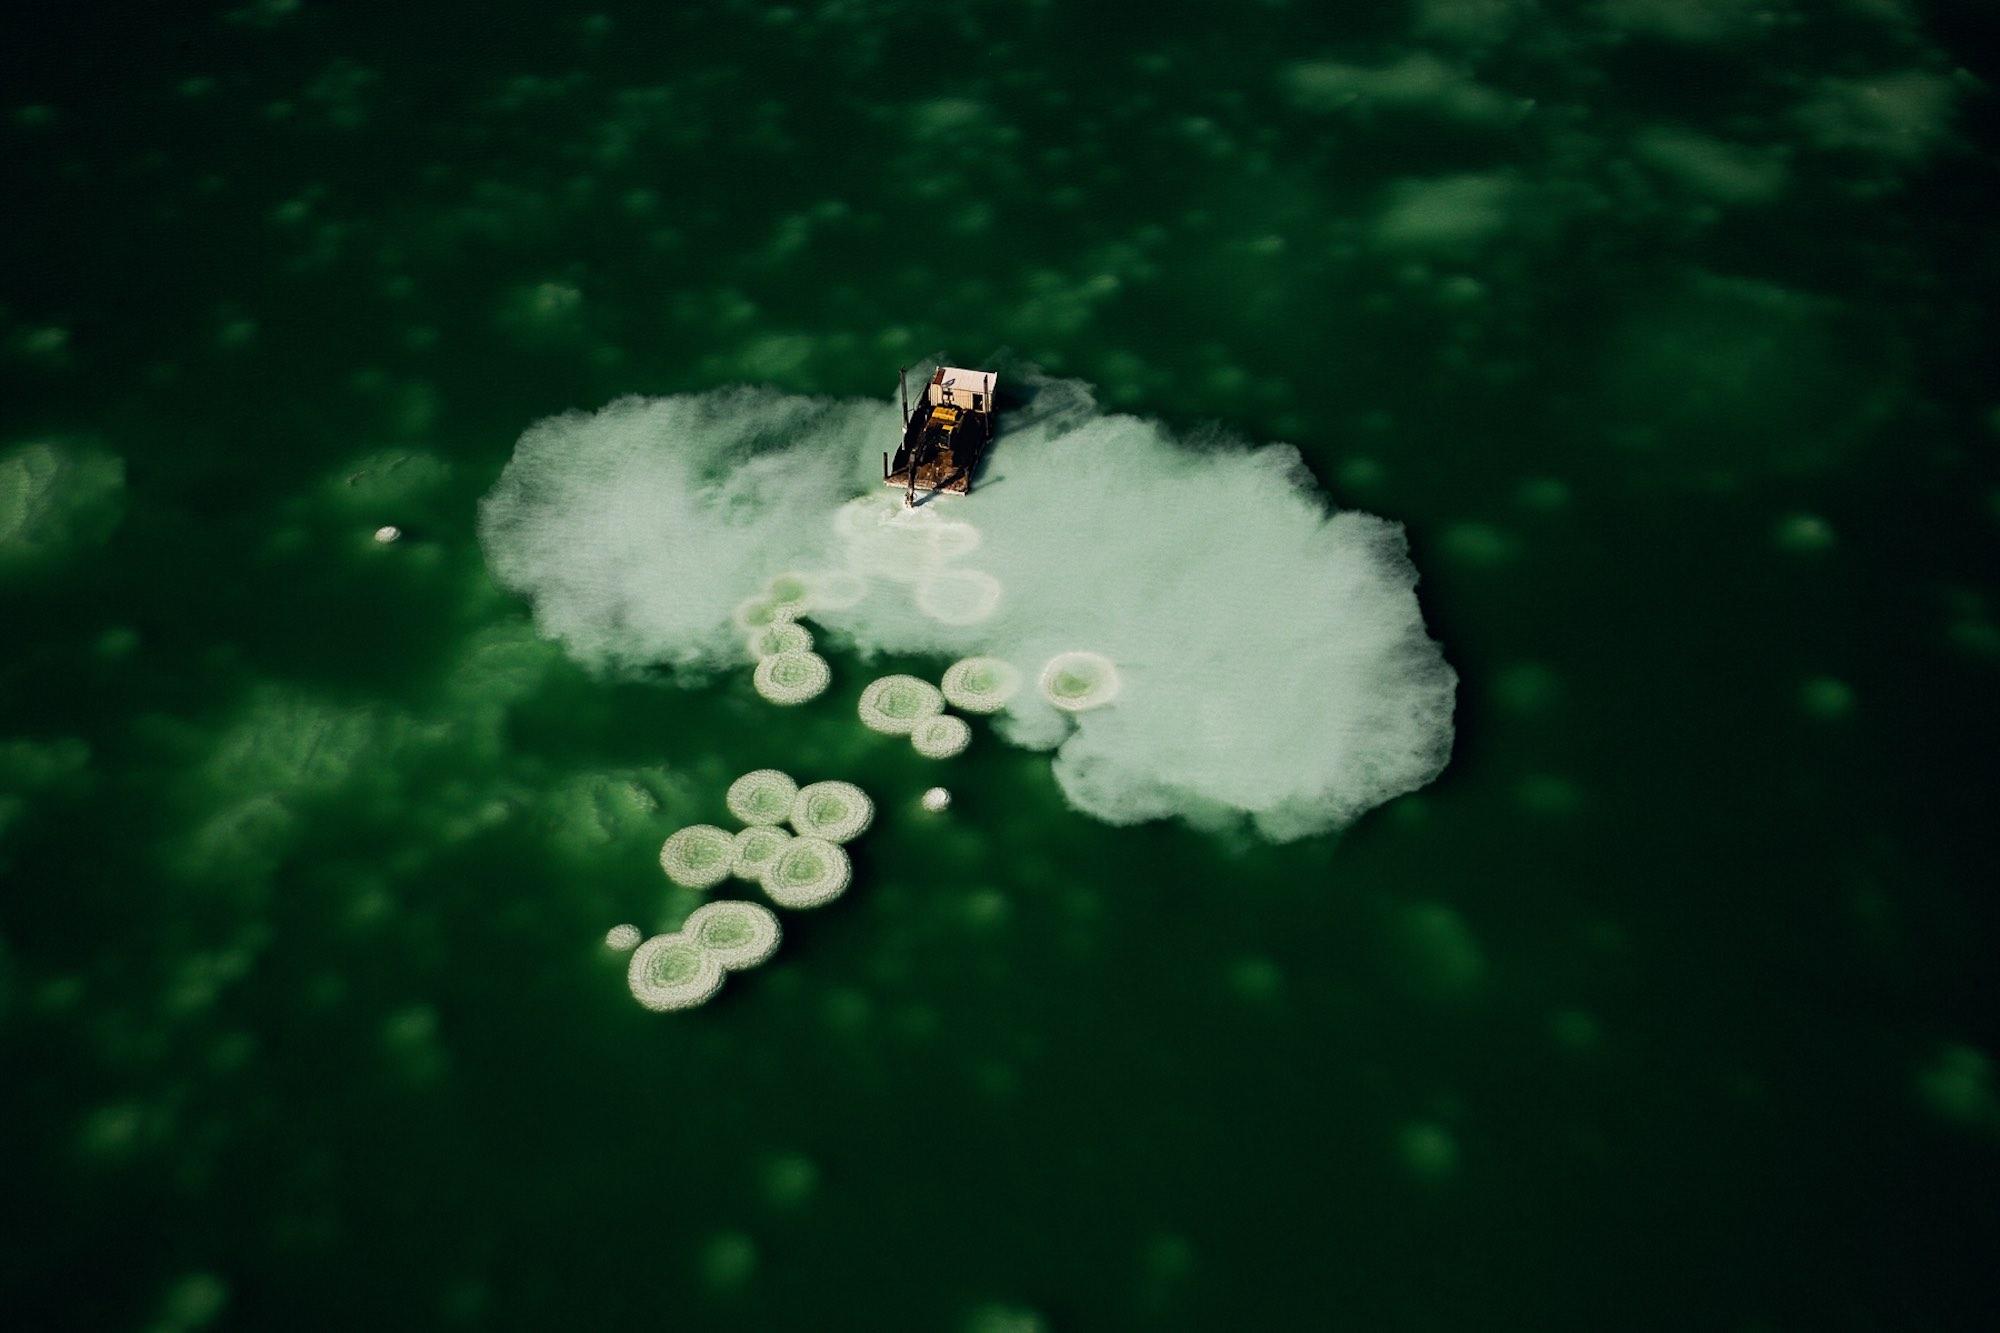 Salt formations - Yann Arthus-Bertrand